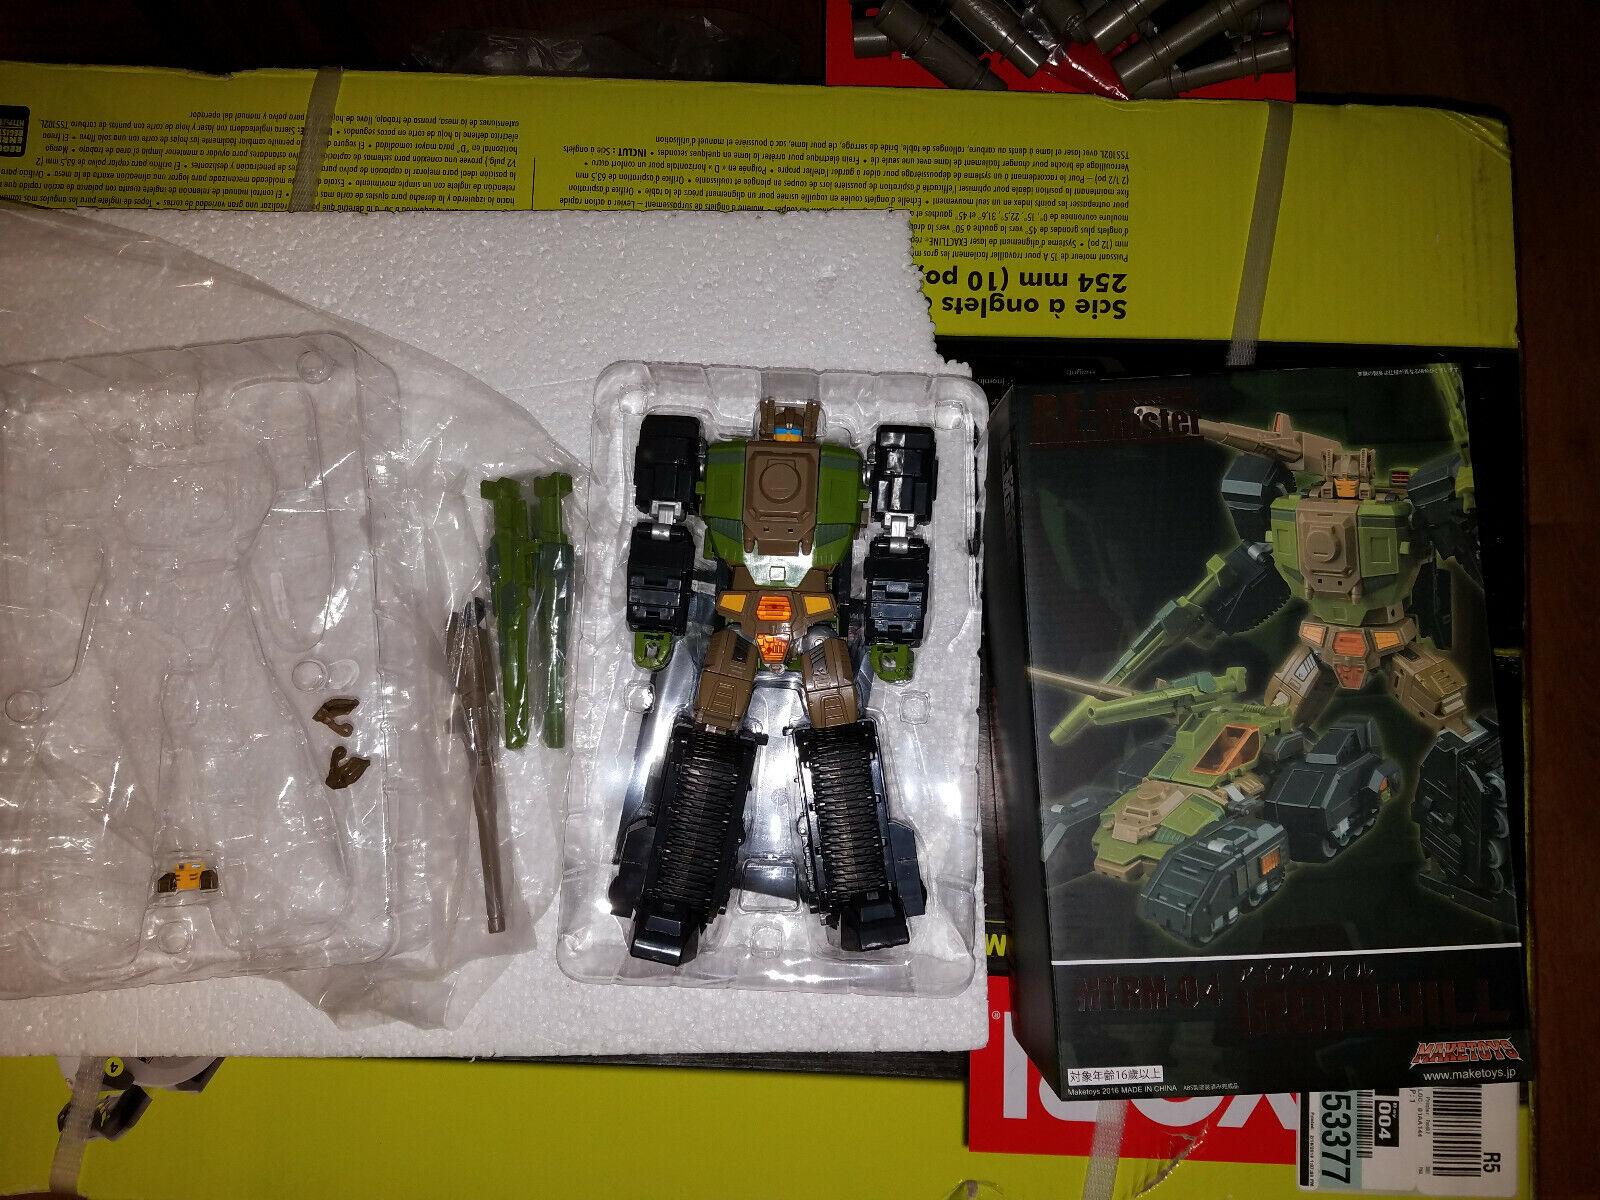 Transformers Maketoys MTRM-04 IRONWILL Masterpiece MP G1 Headmaster Hardhead +MO